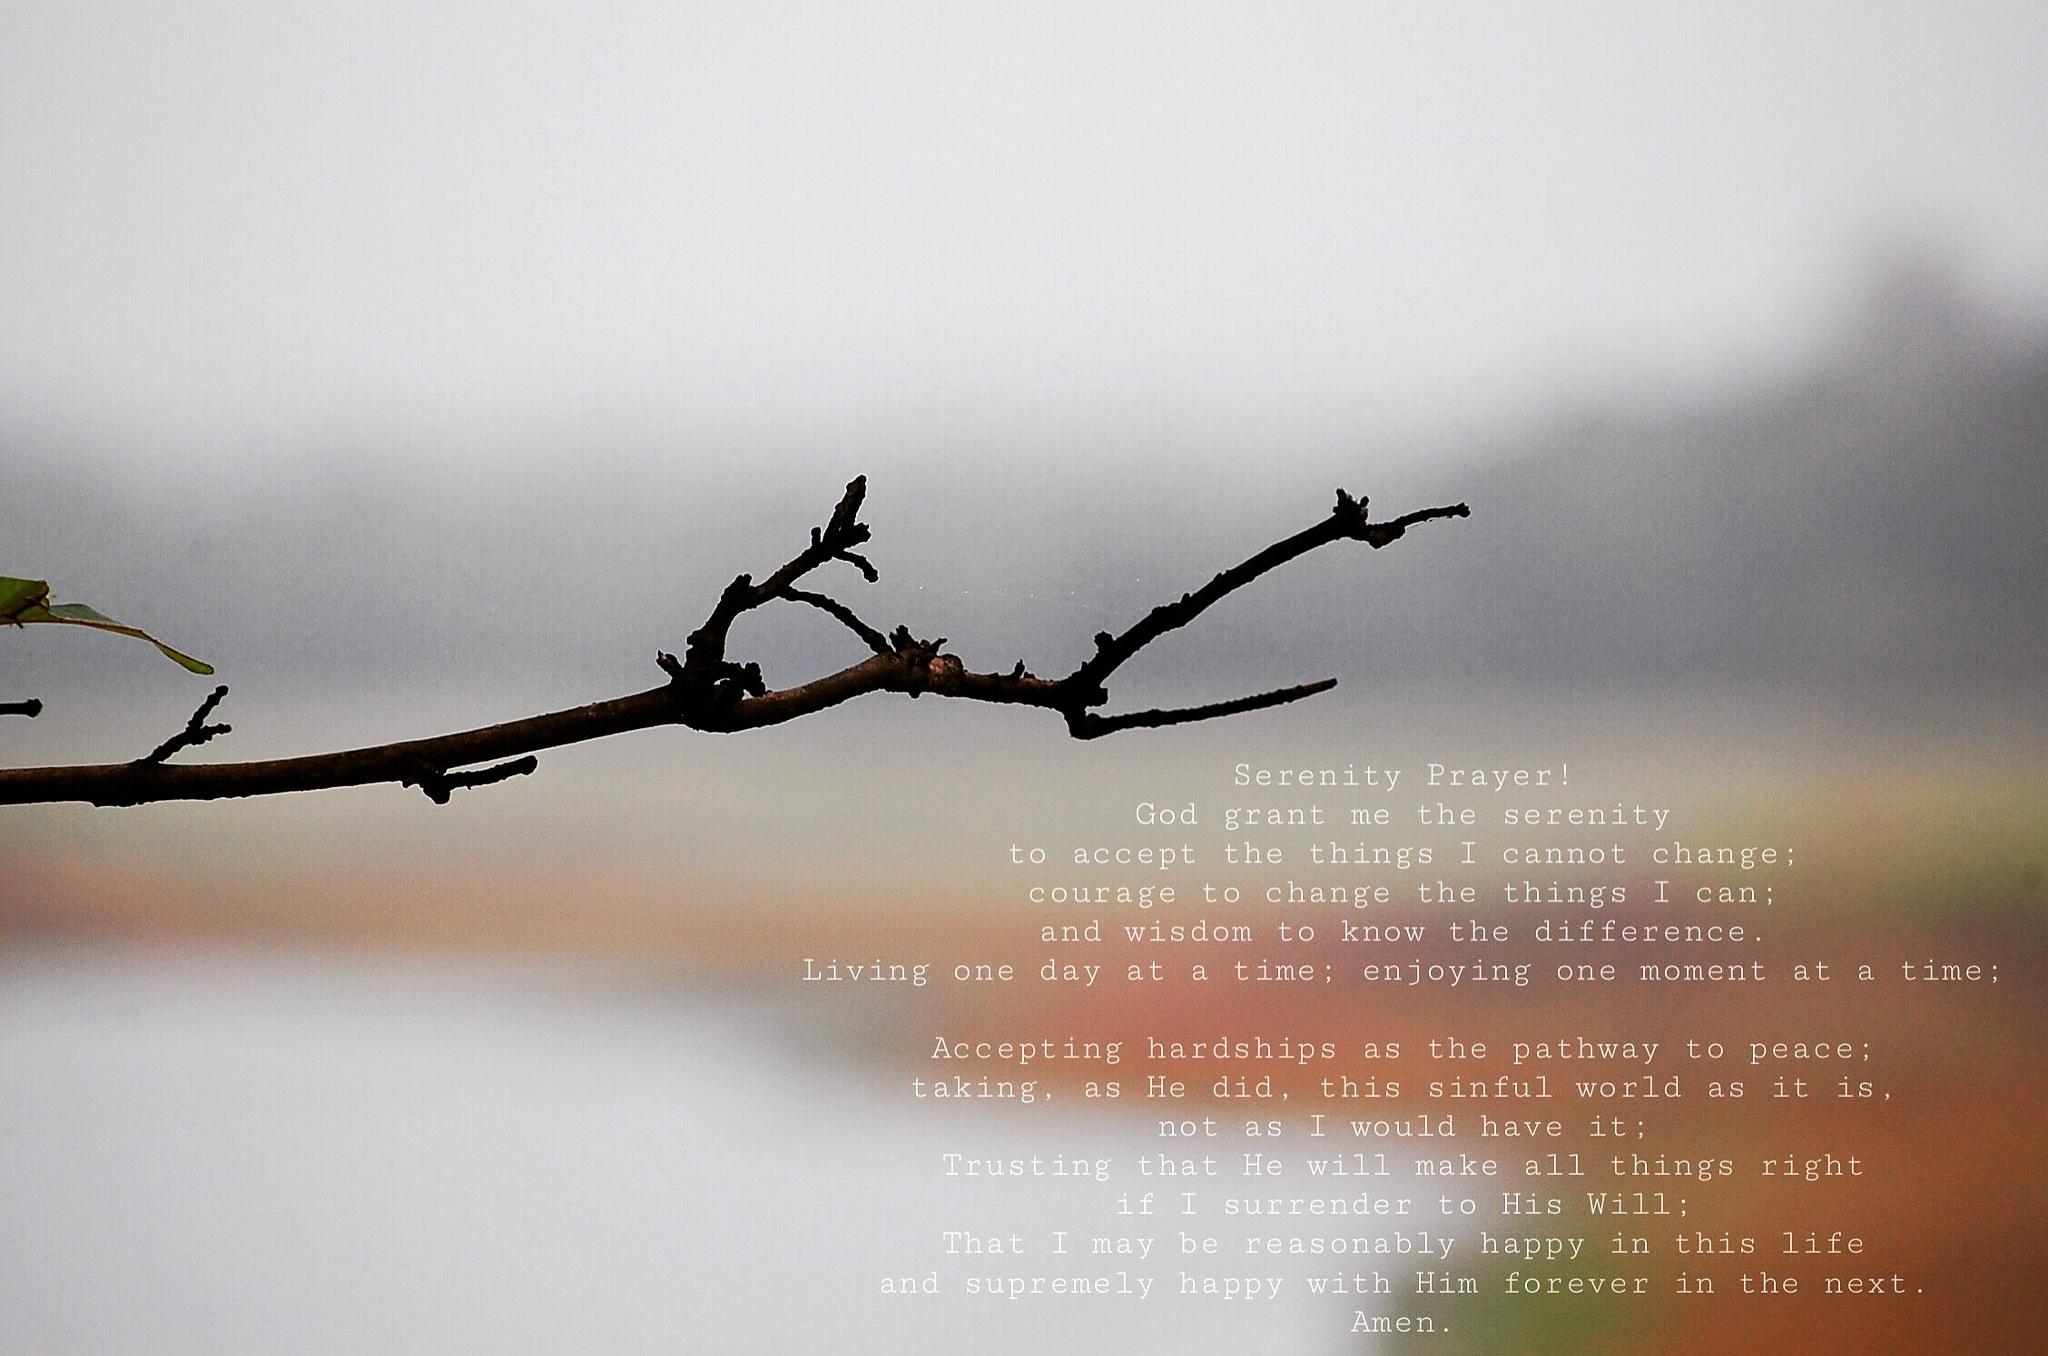 Serenity Prayer  by michaelstonephotography